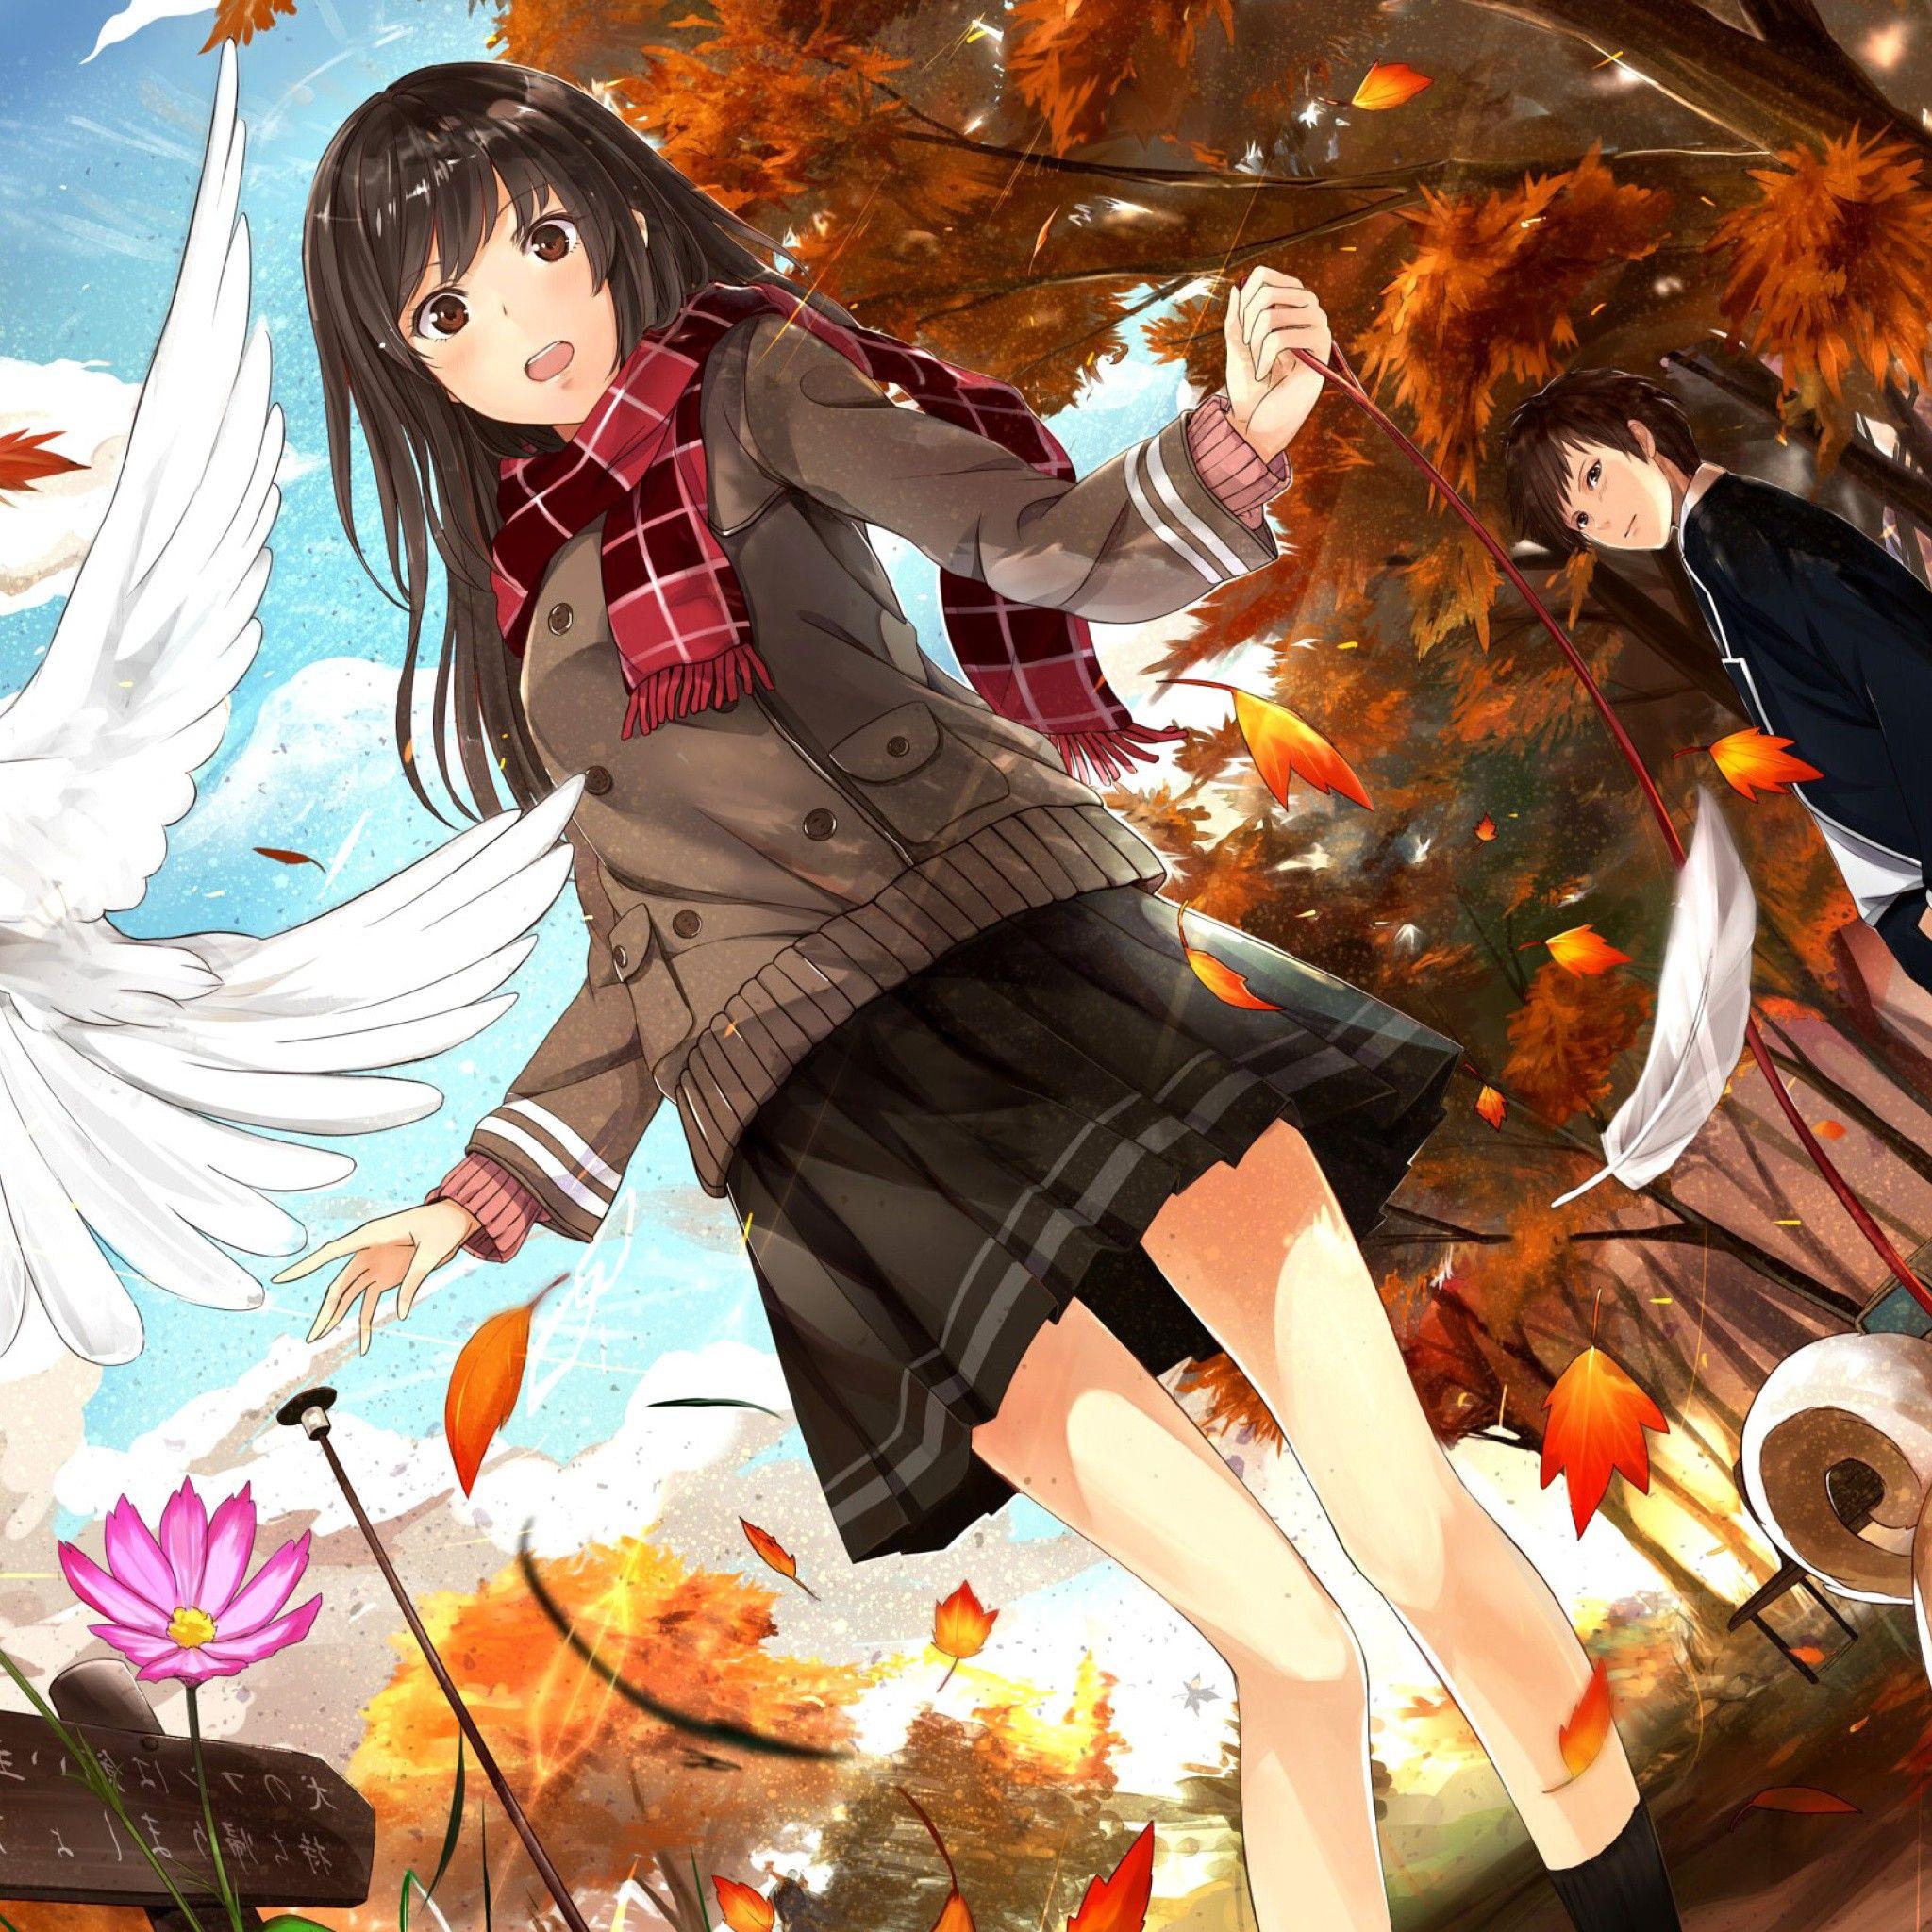 Kazabana Fuuka Tap To See More Thanksgiving Anime Wallpapers Mobile9 Anime Wallpaper Anime I Love Anime